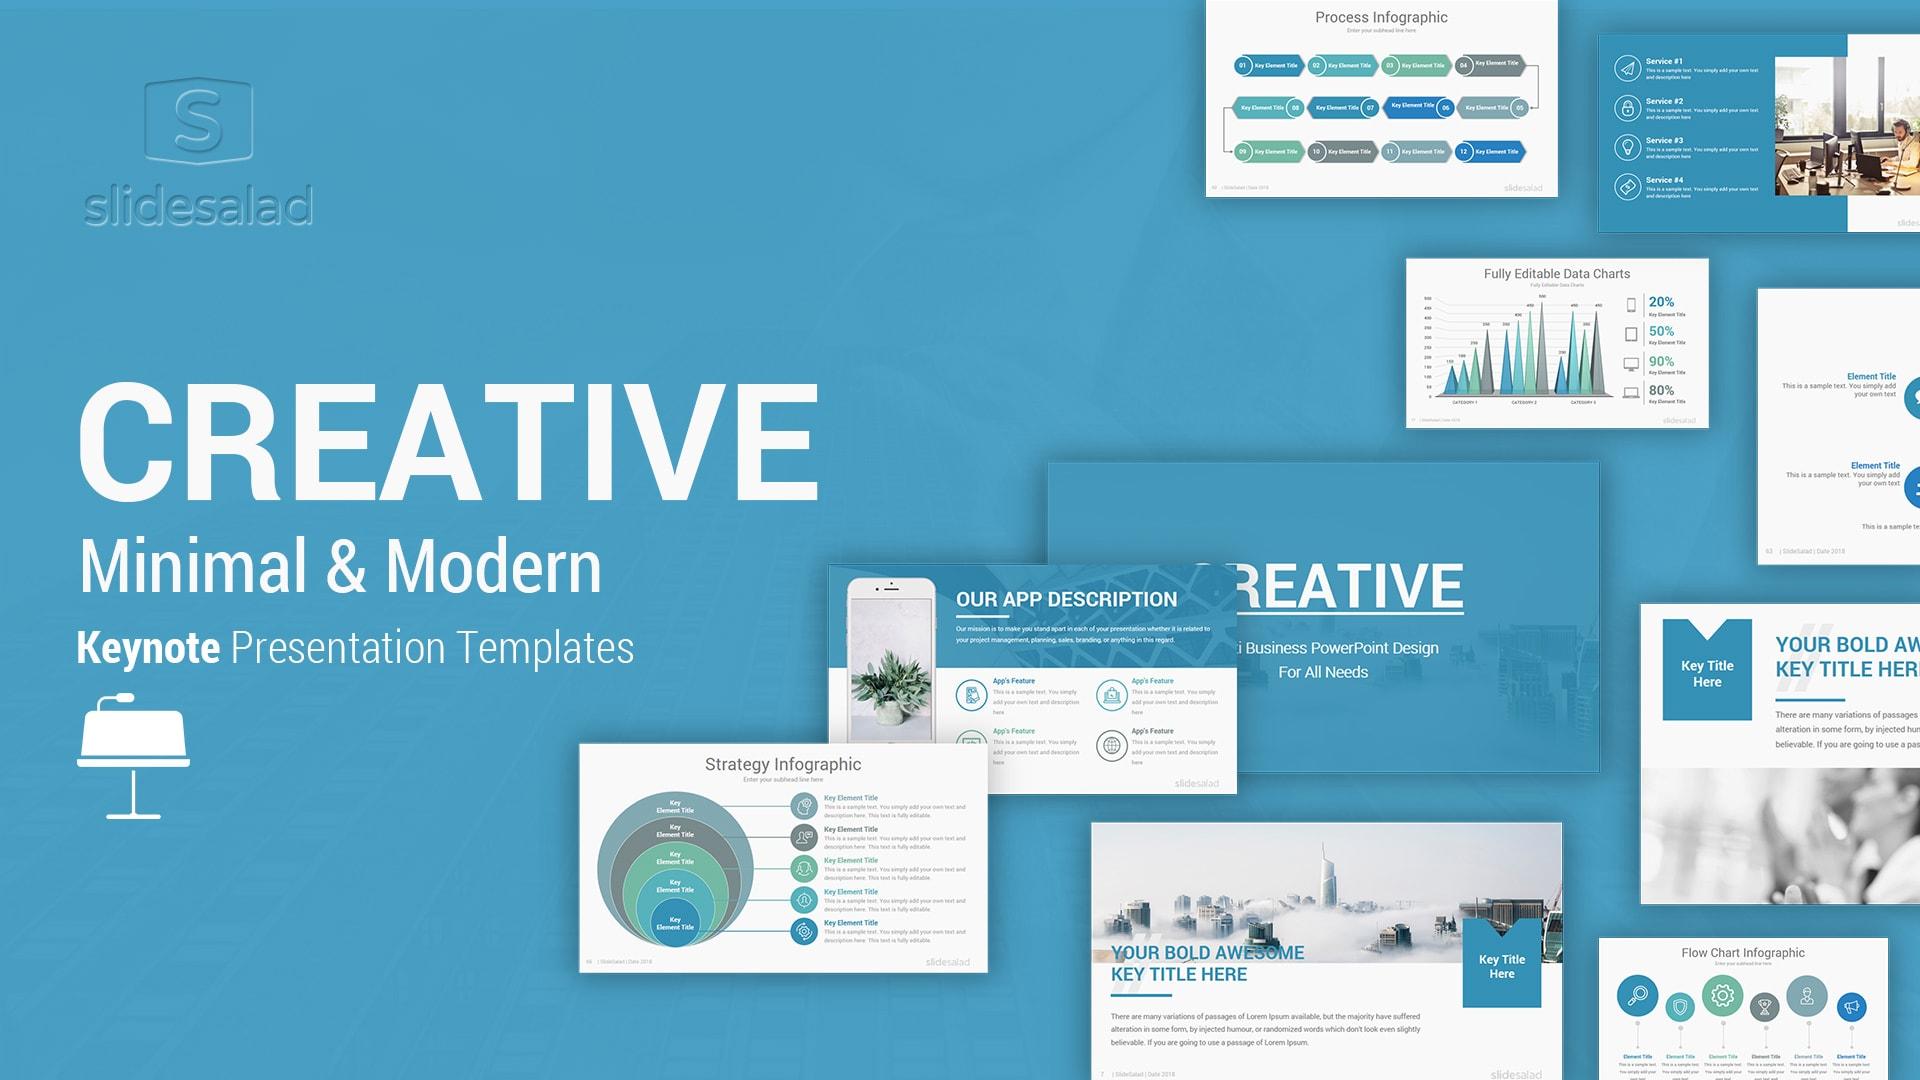 Creative Minimalist Keynote Template – Colorful Mac Keynote Presentation Template